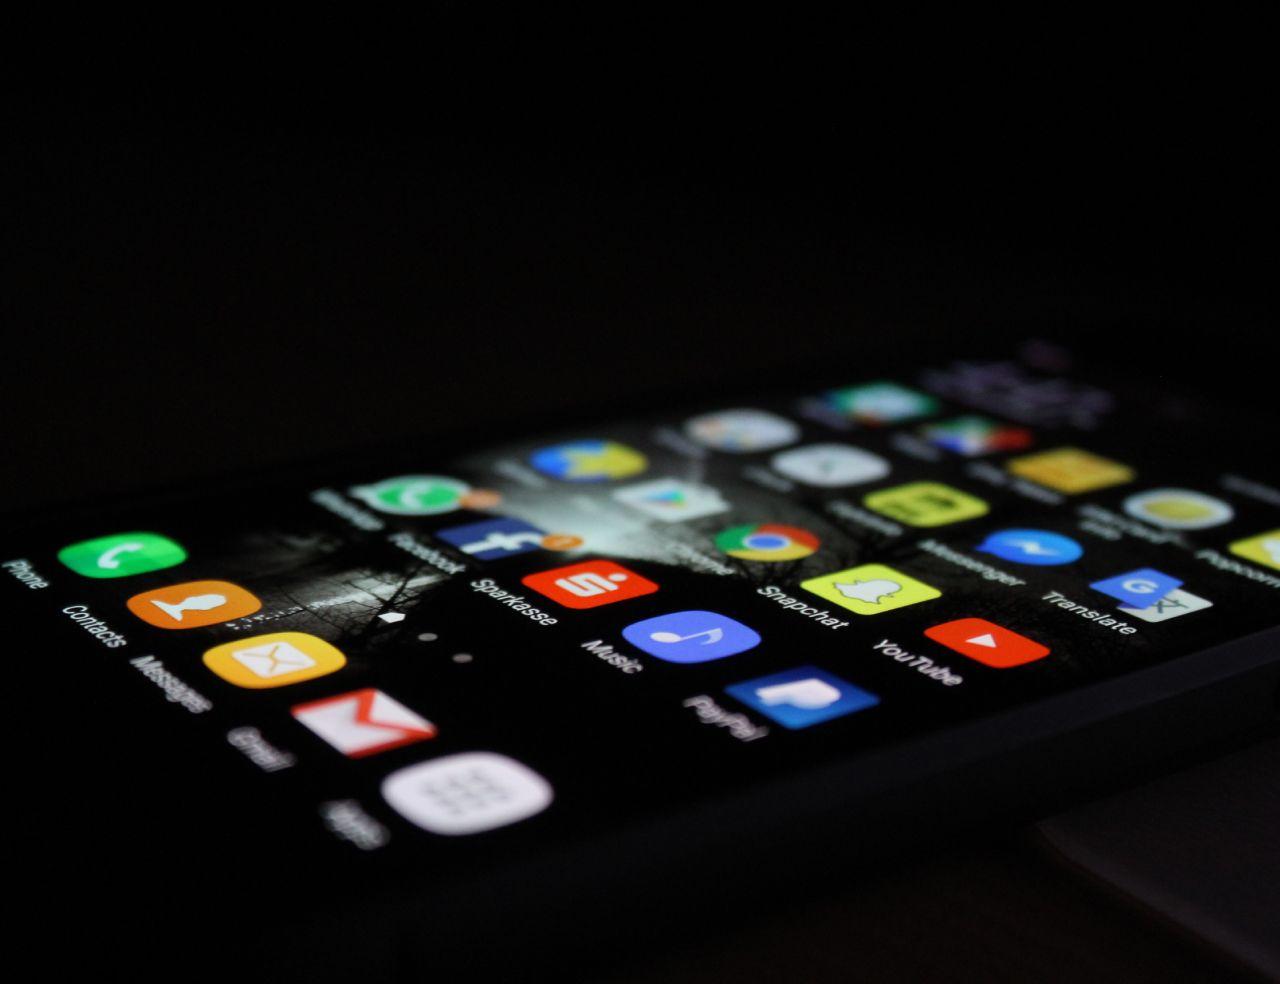 aplikasi-android-wajib